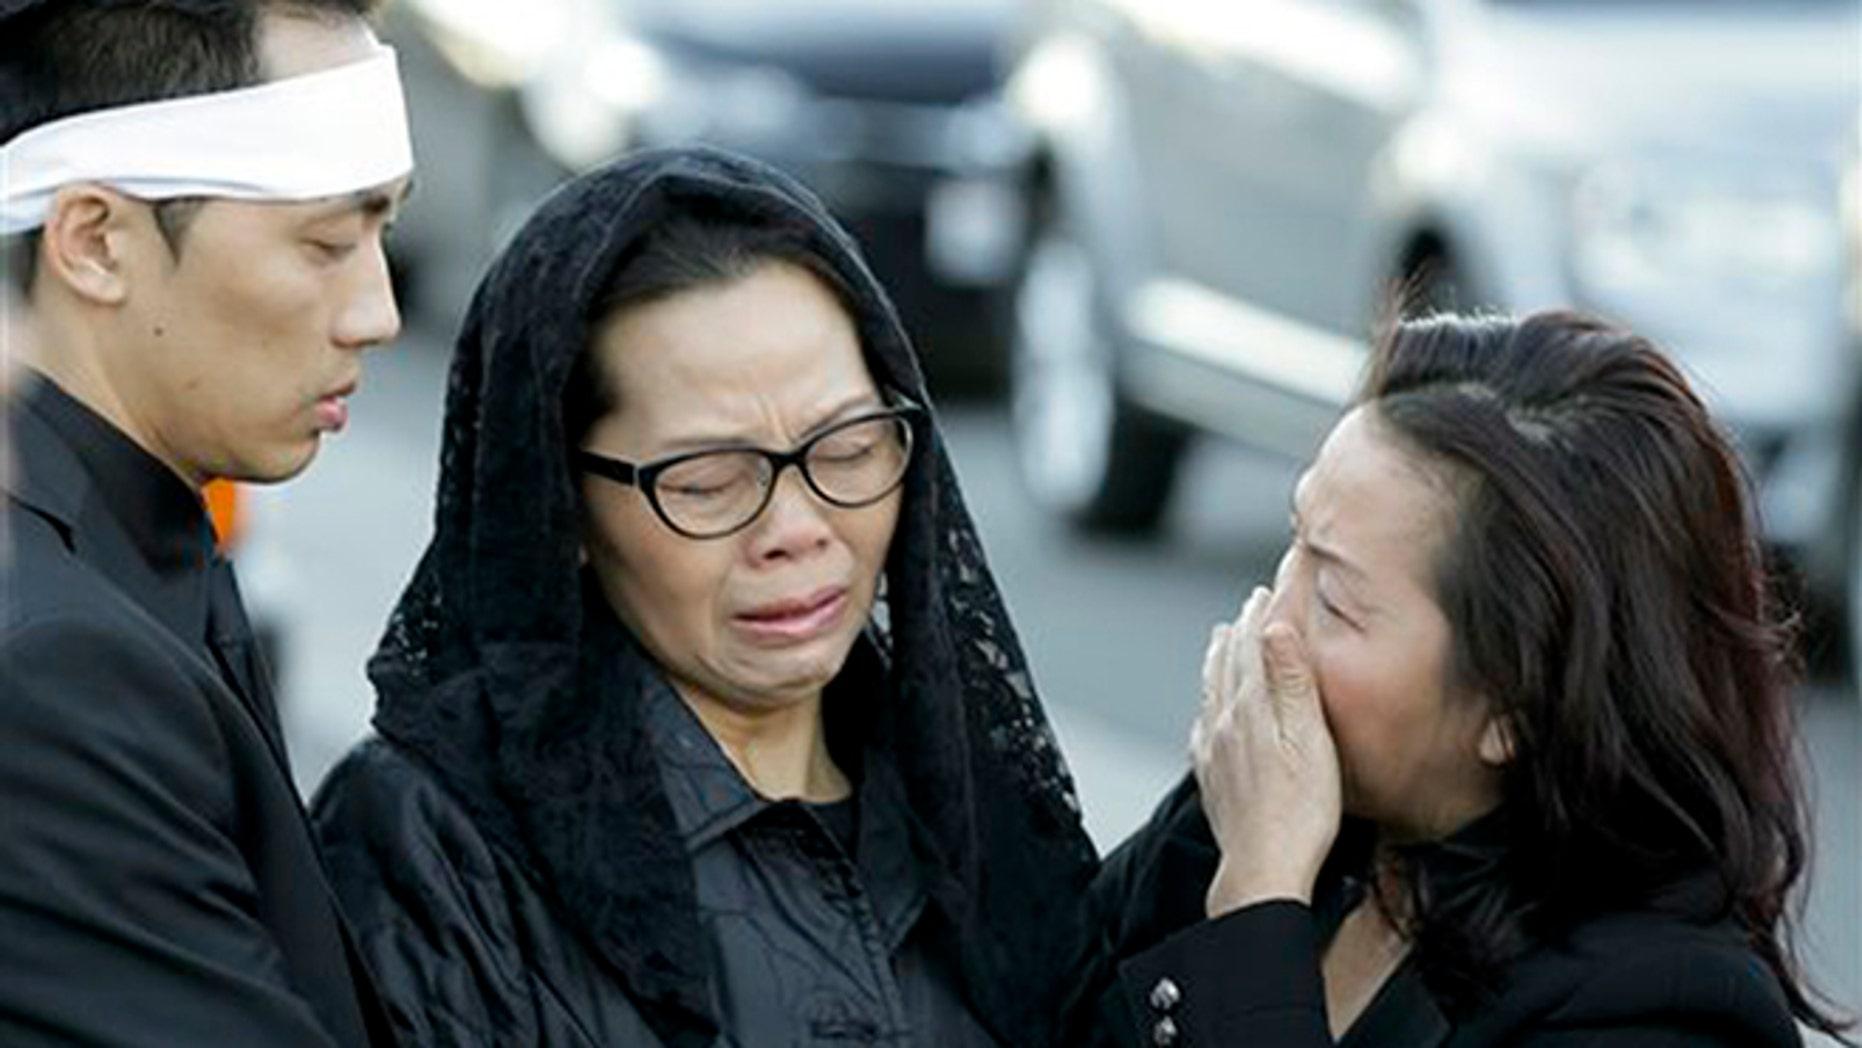 Van Thanh Nguyen, center, arrives for her daughter Tin Nguyen's funeral on Saturday, Dec. 12, 2015 in Santa Ana, Calif. Nguyen died in the mass shootings in San Bernardino, Calif., on Dec. 2. (AP Photo/Chris Carlson)